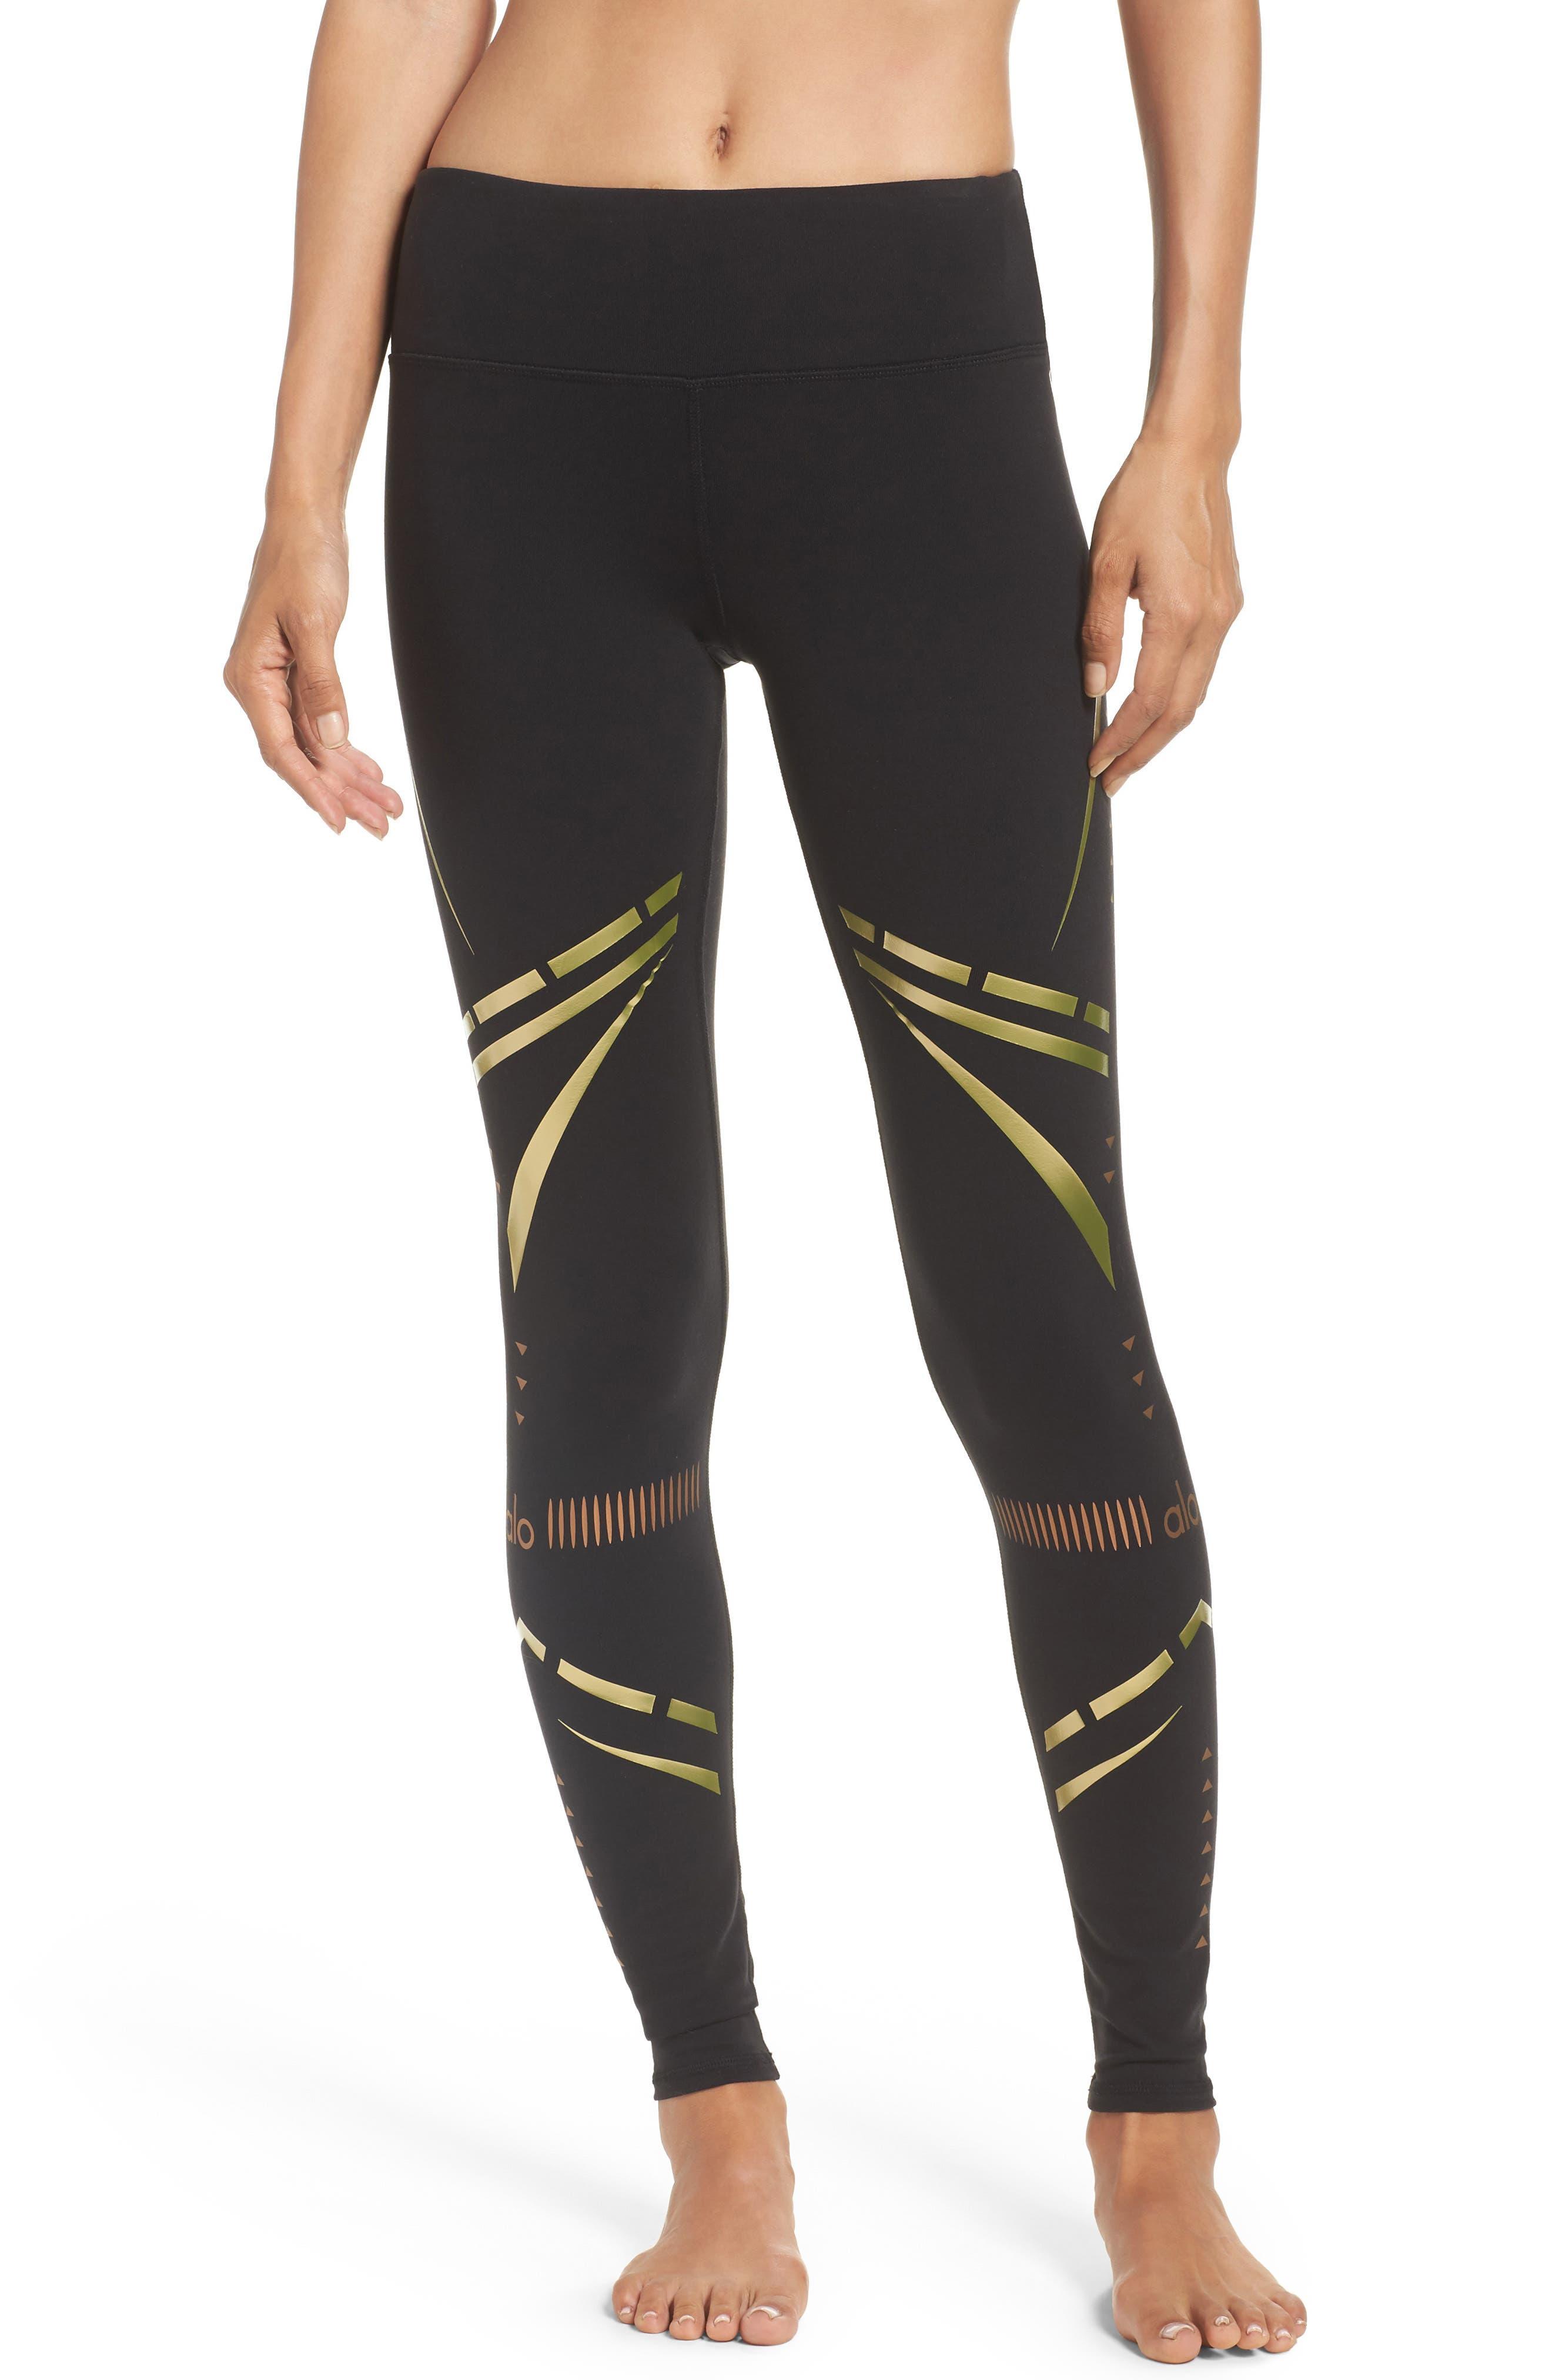 Main Image - Alo 'Airbrushed' Leggings